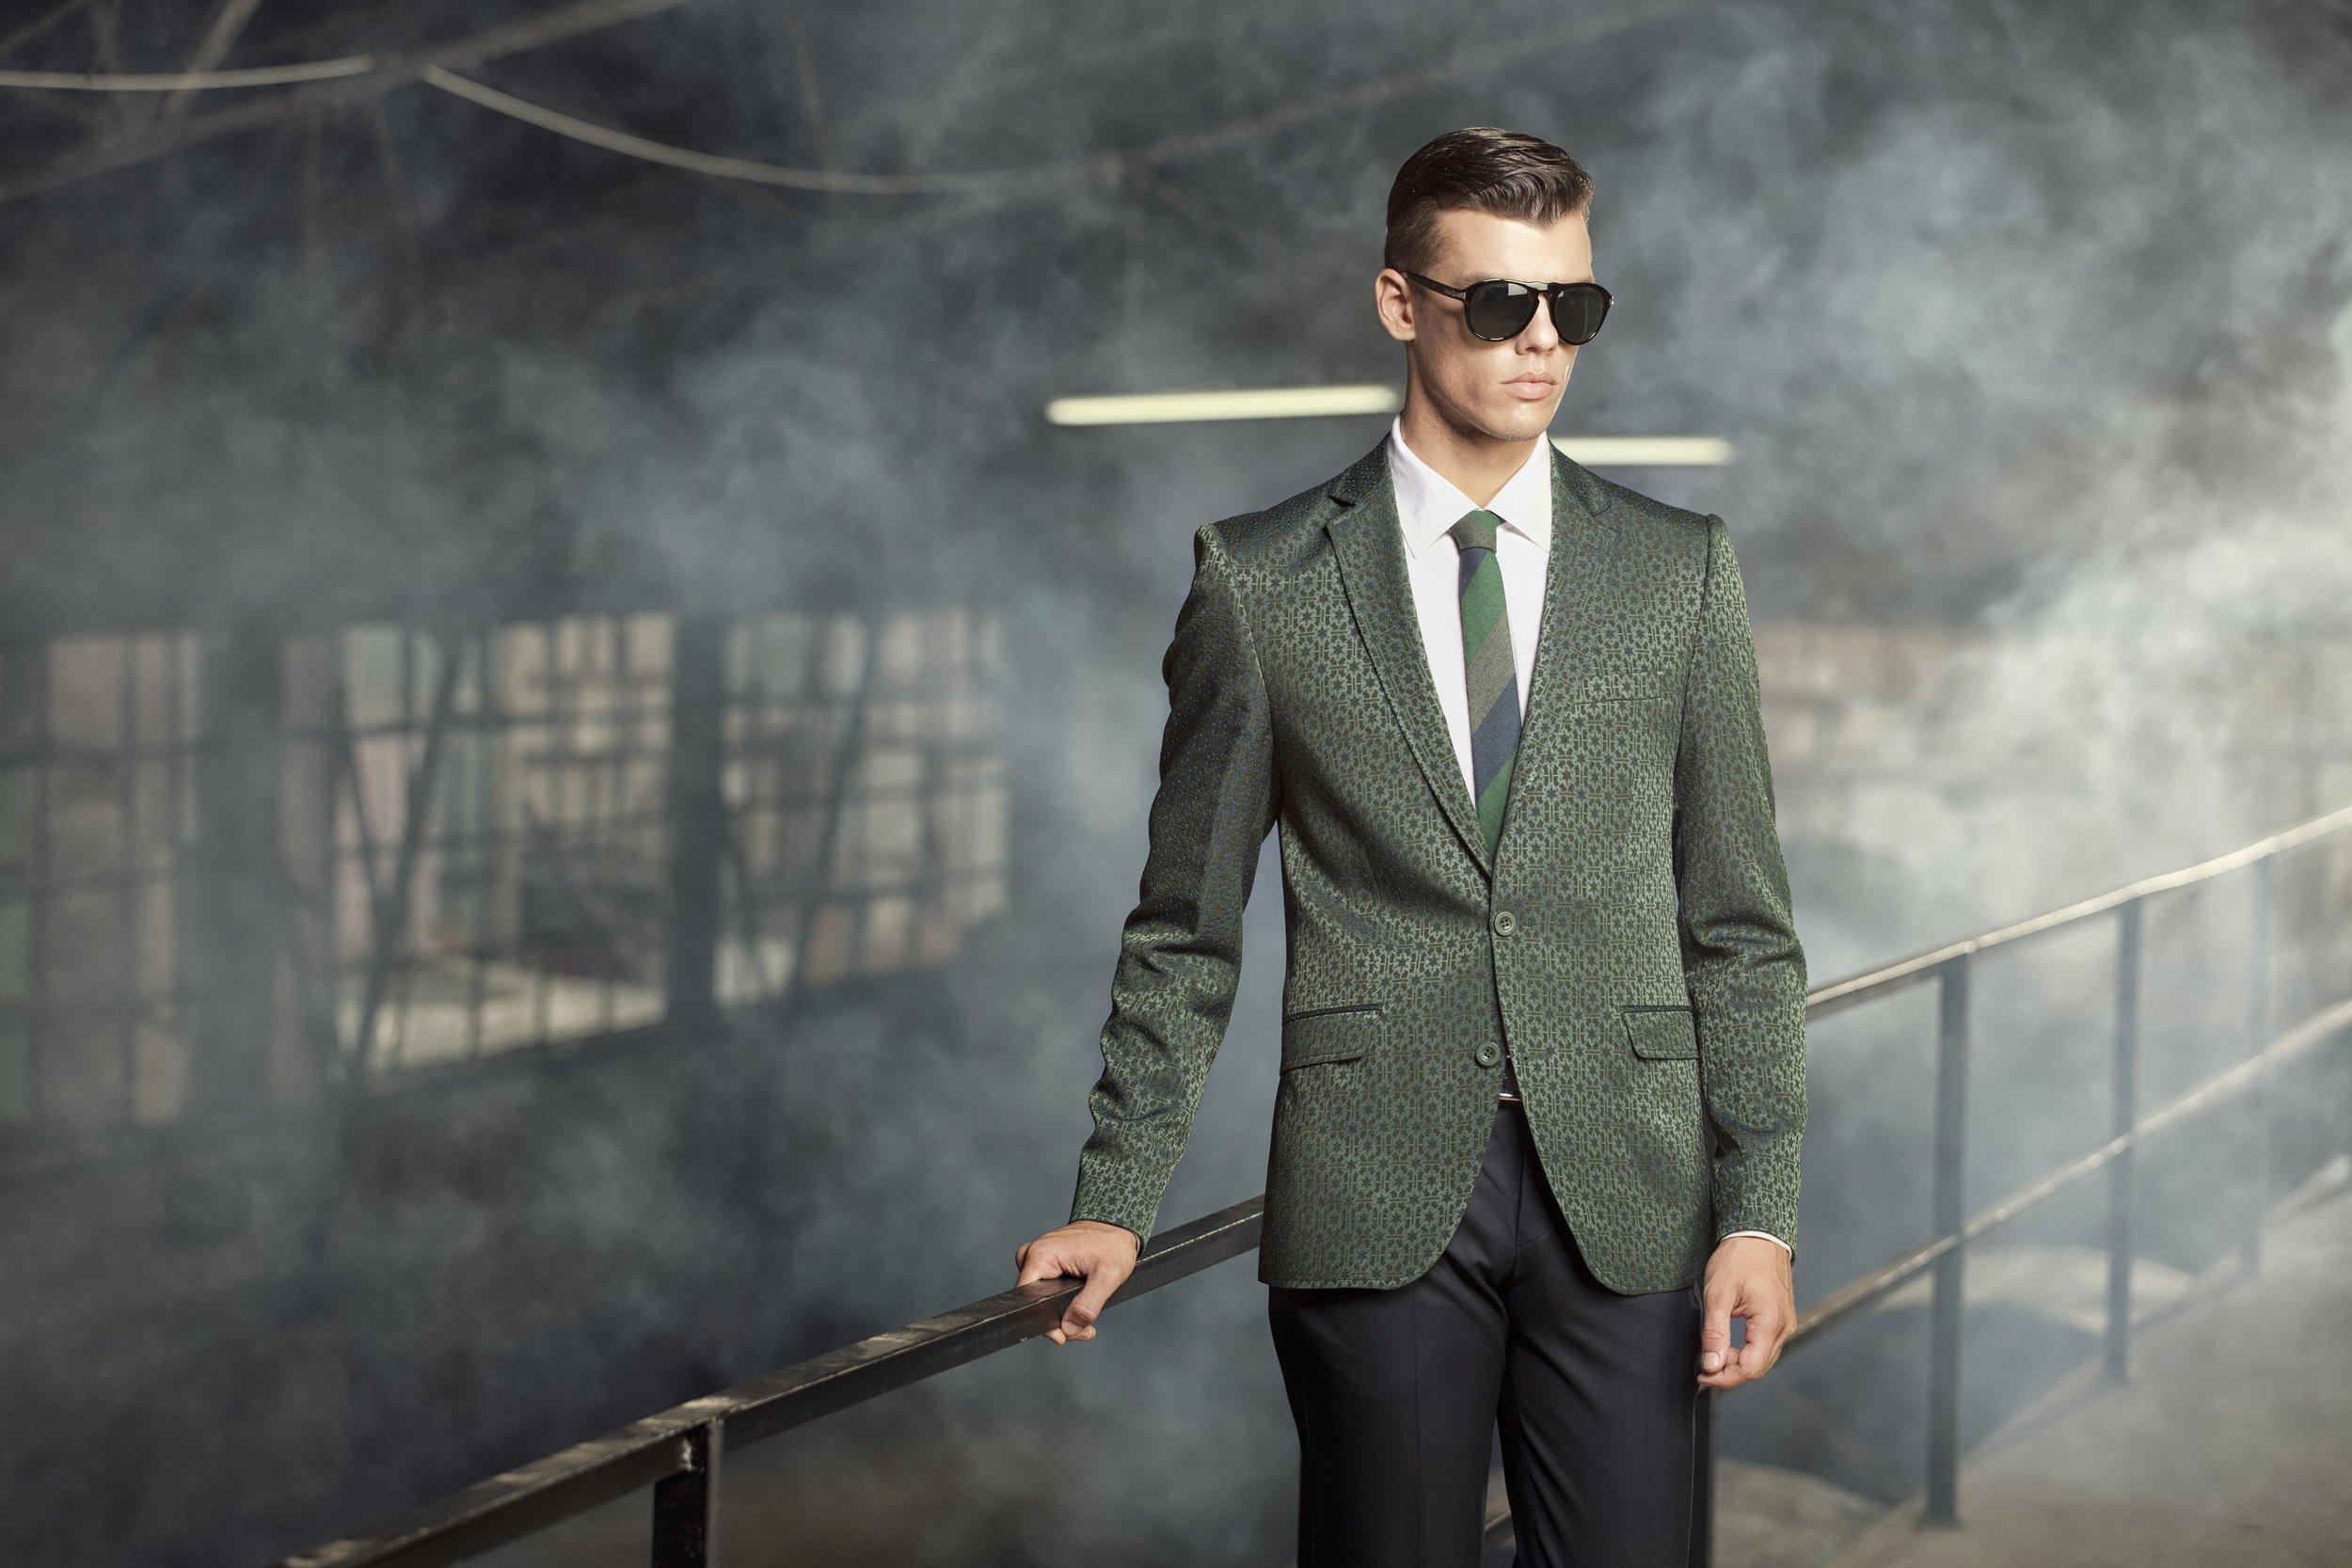 Ugur_Bektas_Fashion_Moda_fotograf_Set_7_0011.jpg